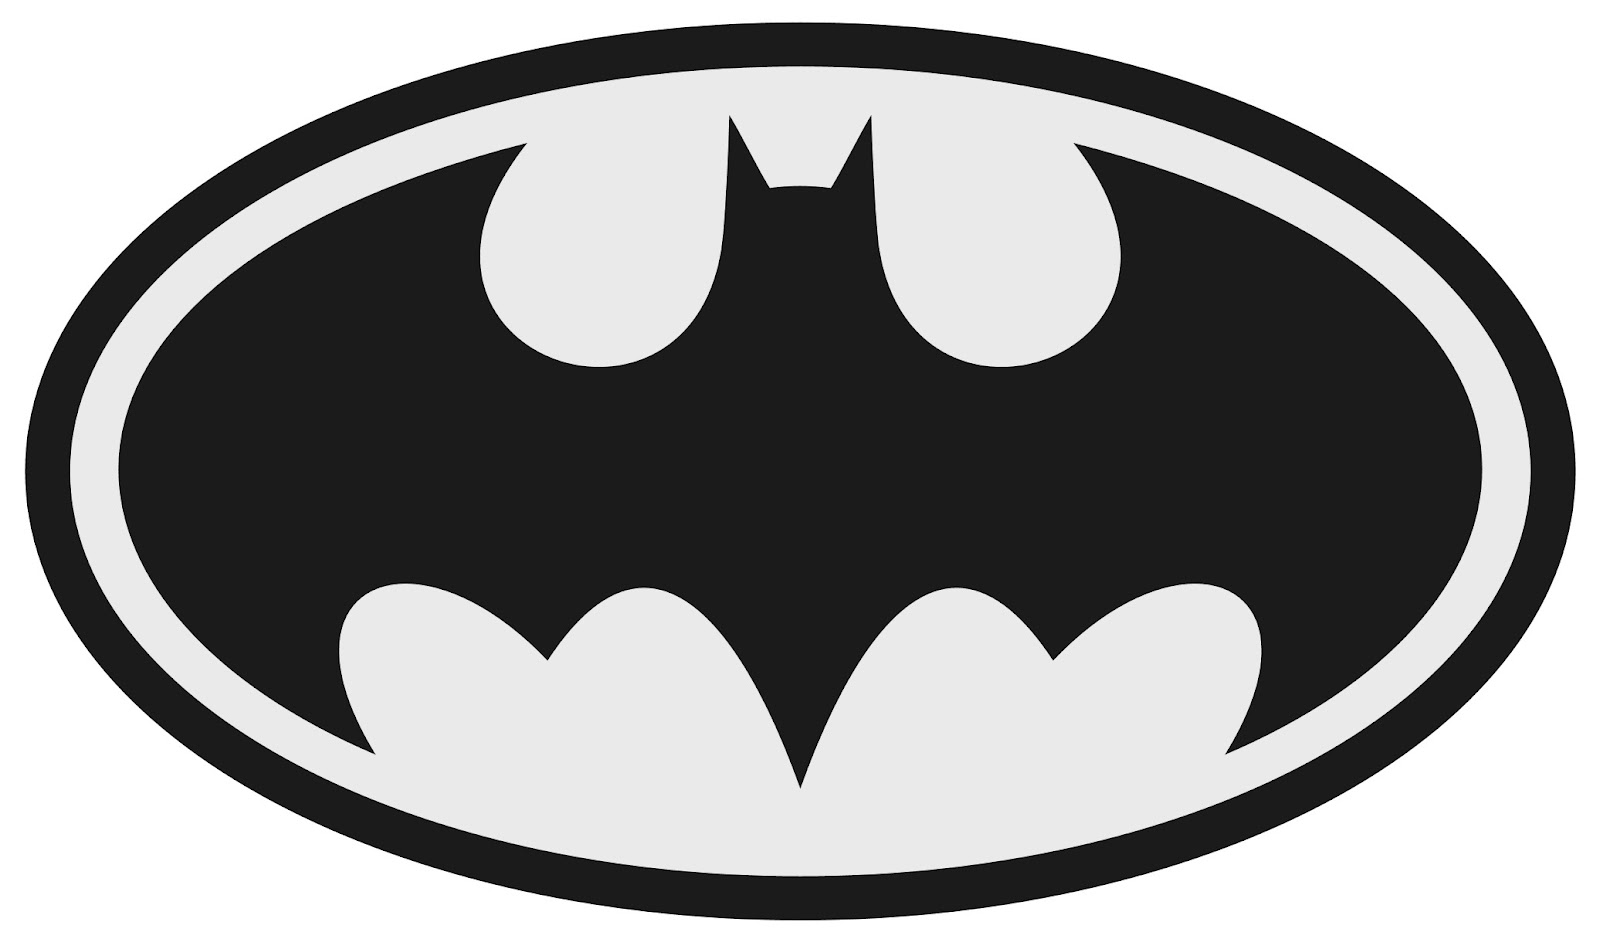 Batman clipart black and white Free Batman Images Black And